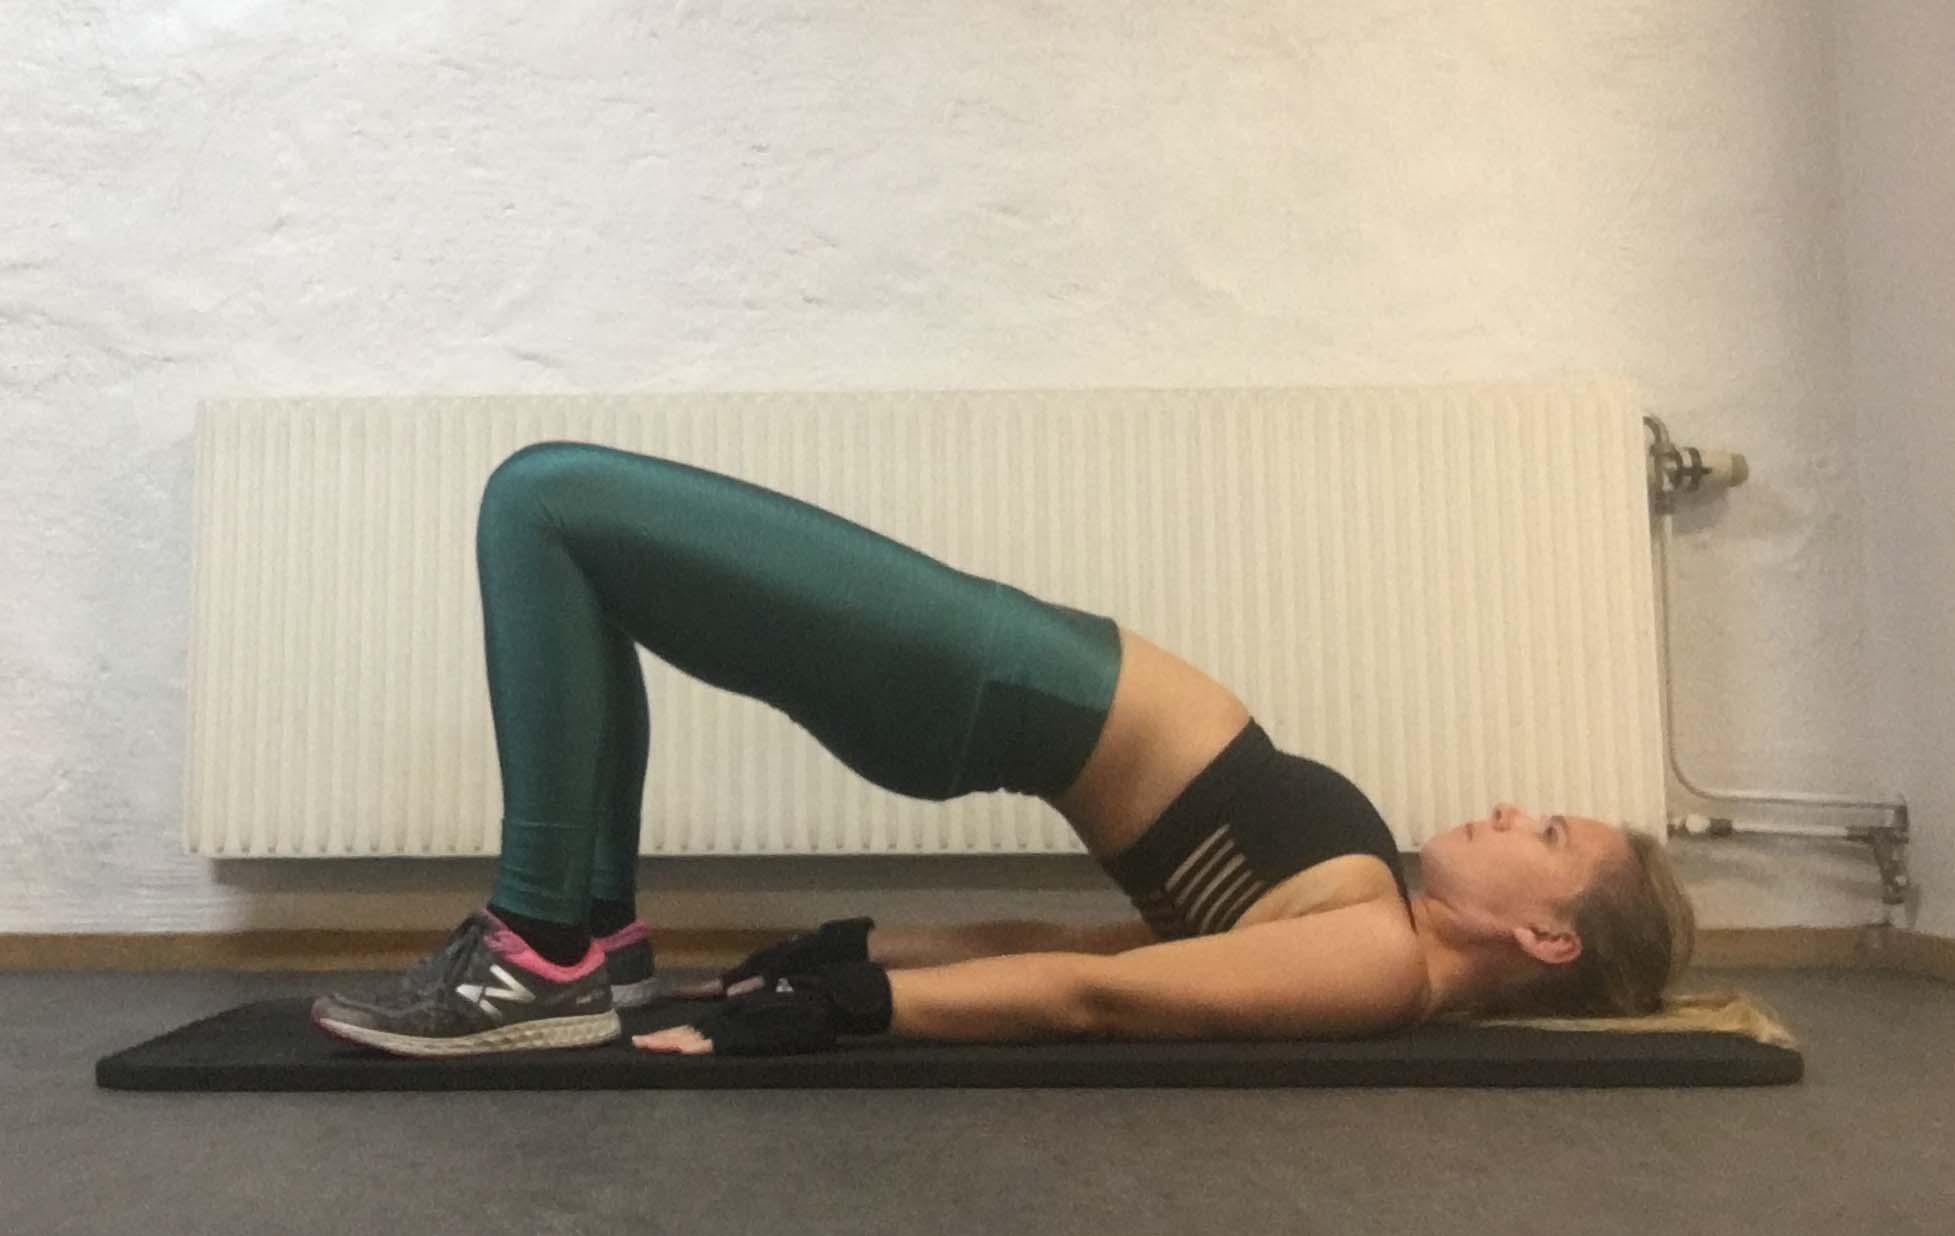 Yogapositioner bro brygga yogaövning